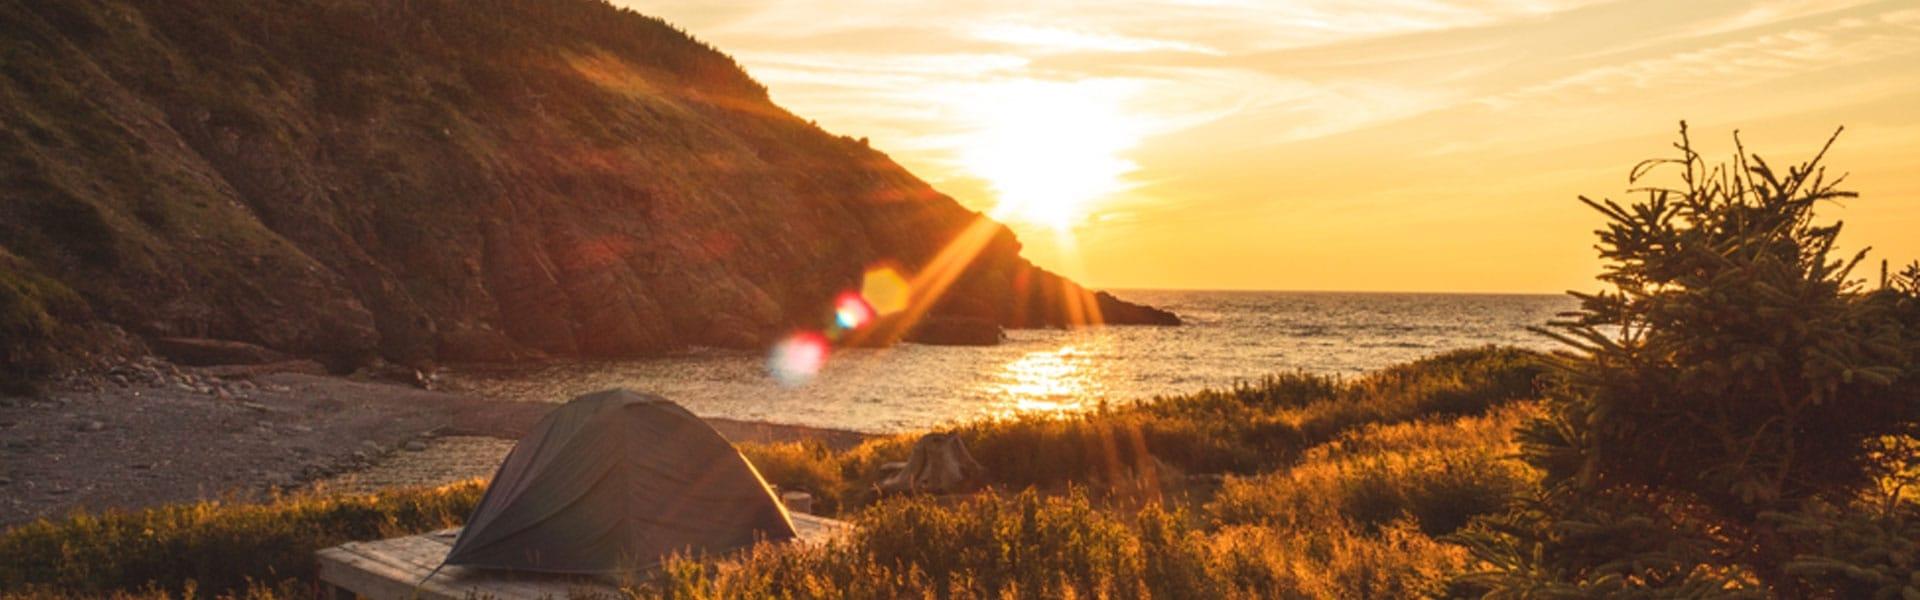 Sunrise over a stunning coastal scene